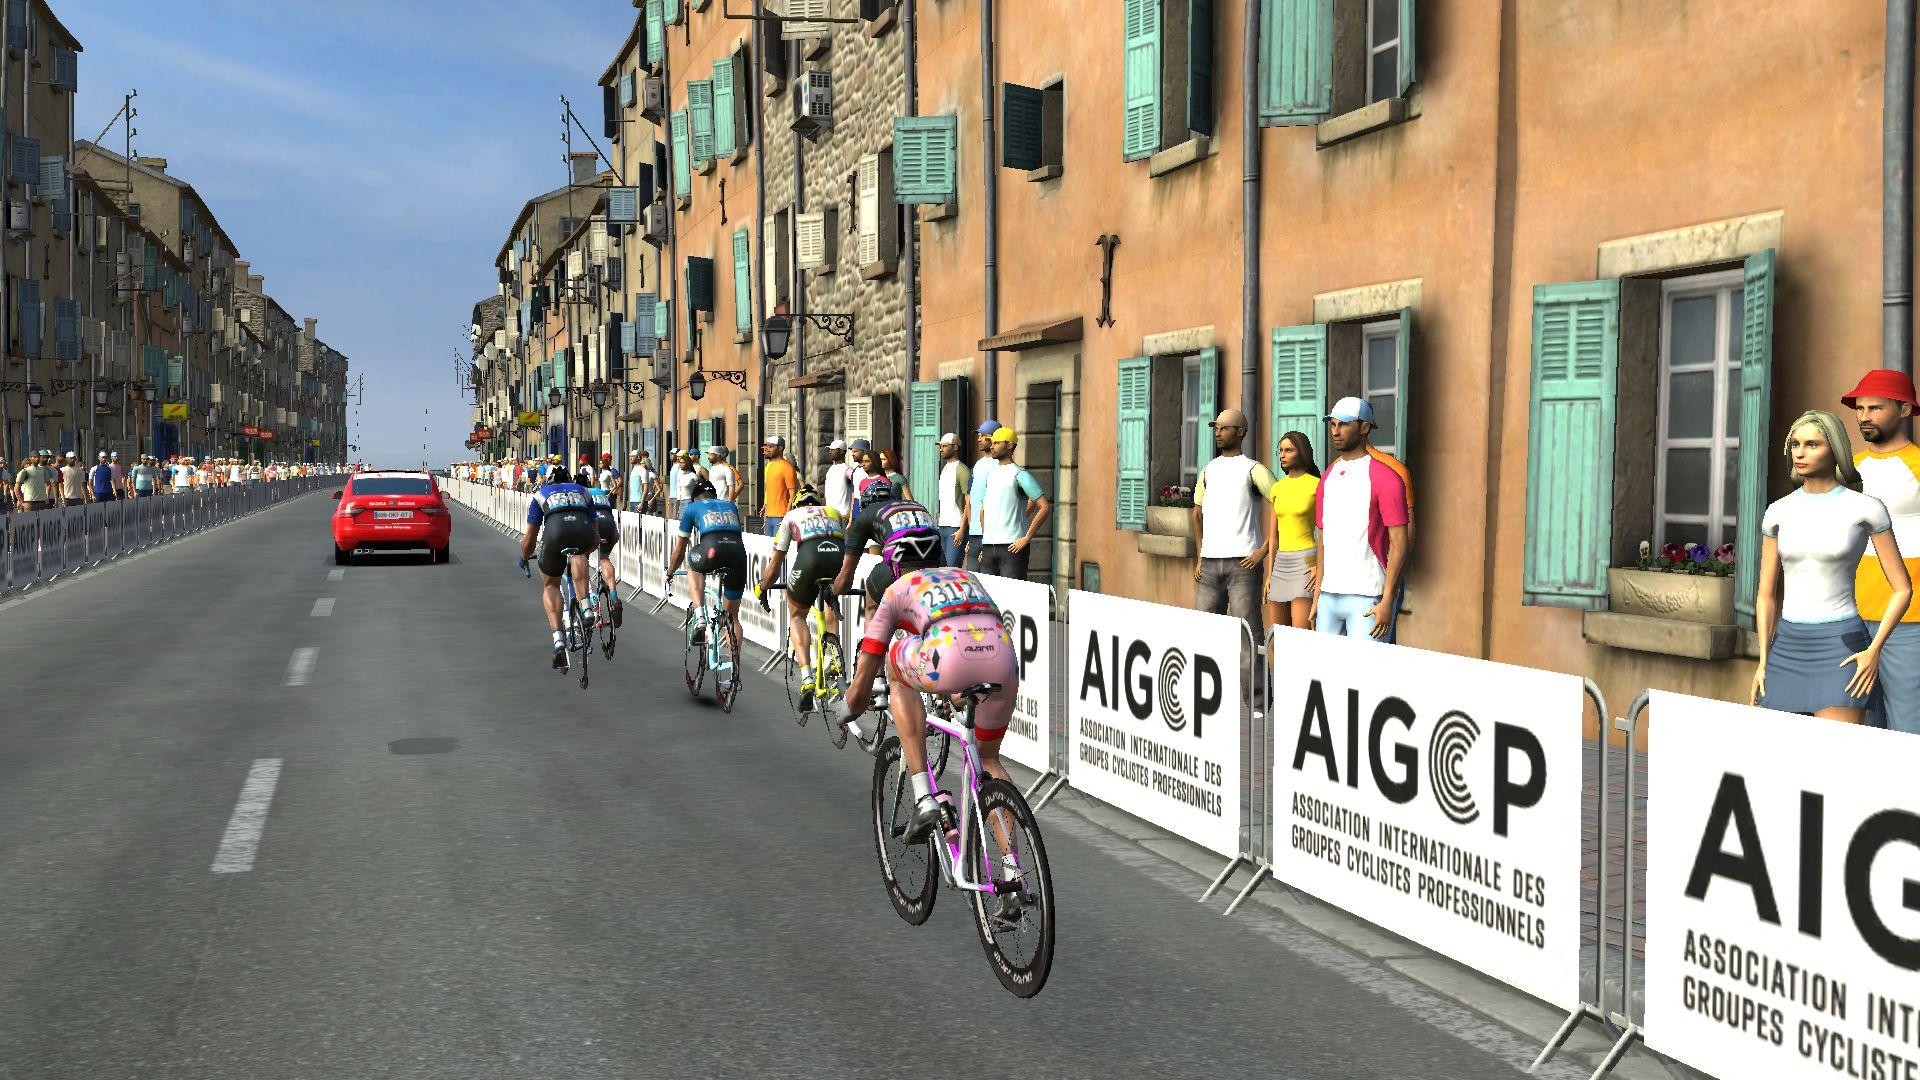 pcmdaily.com/images/mg/2019/Races/GTM/Giro/mg19_giro_10_PCM0087.jpg